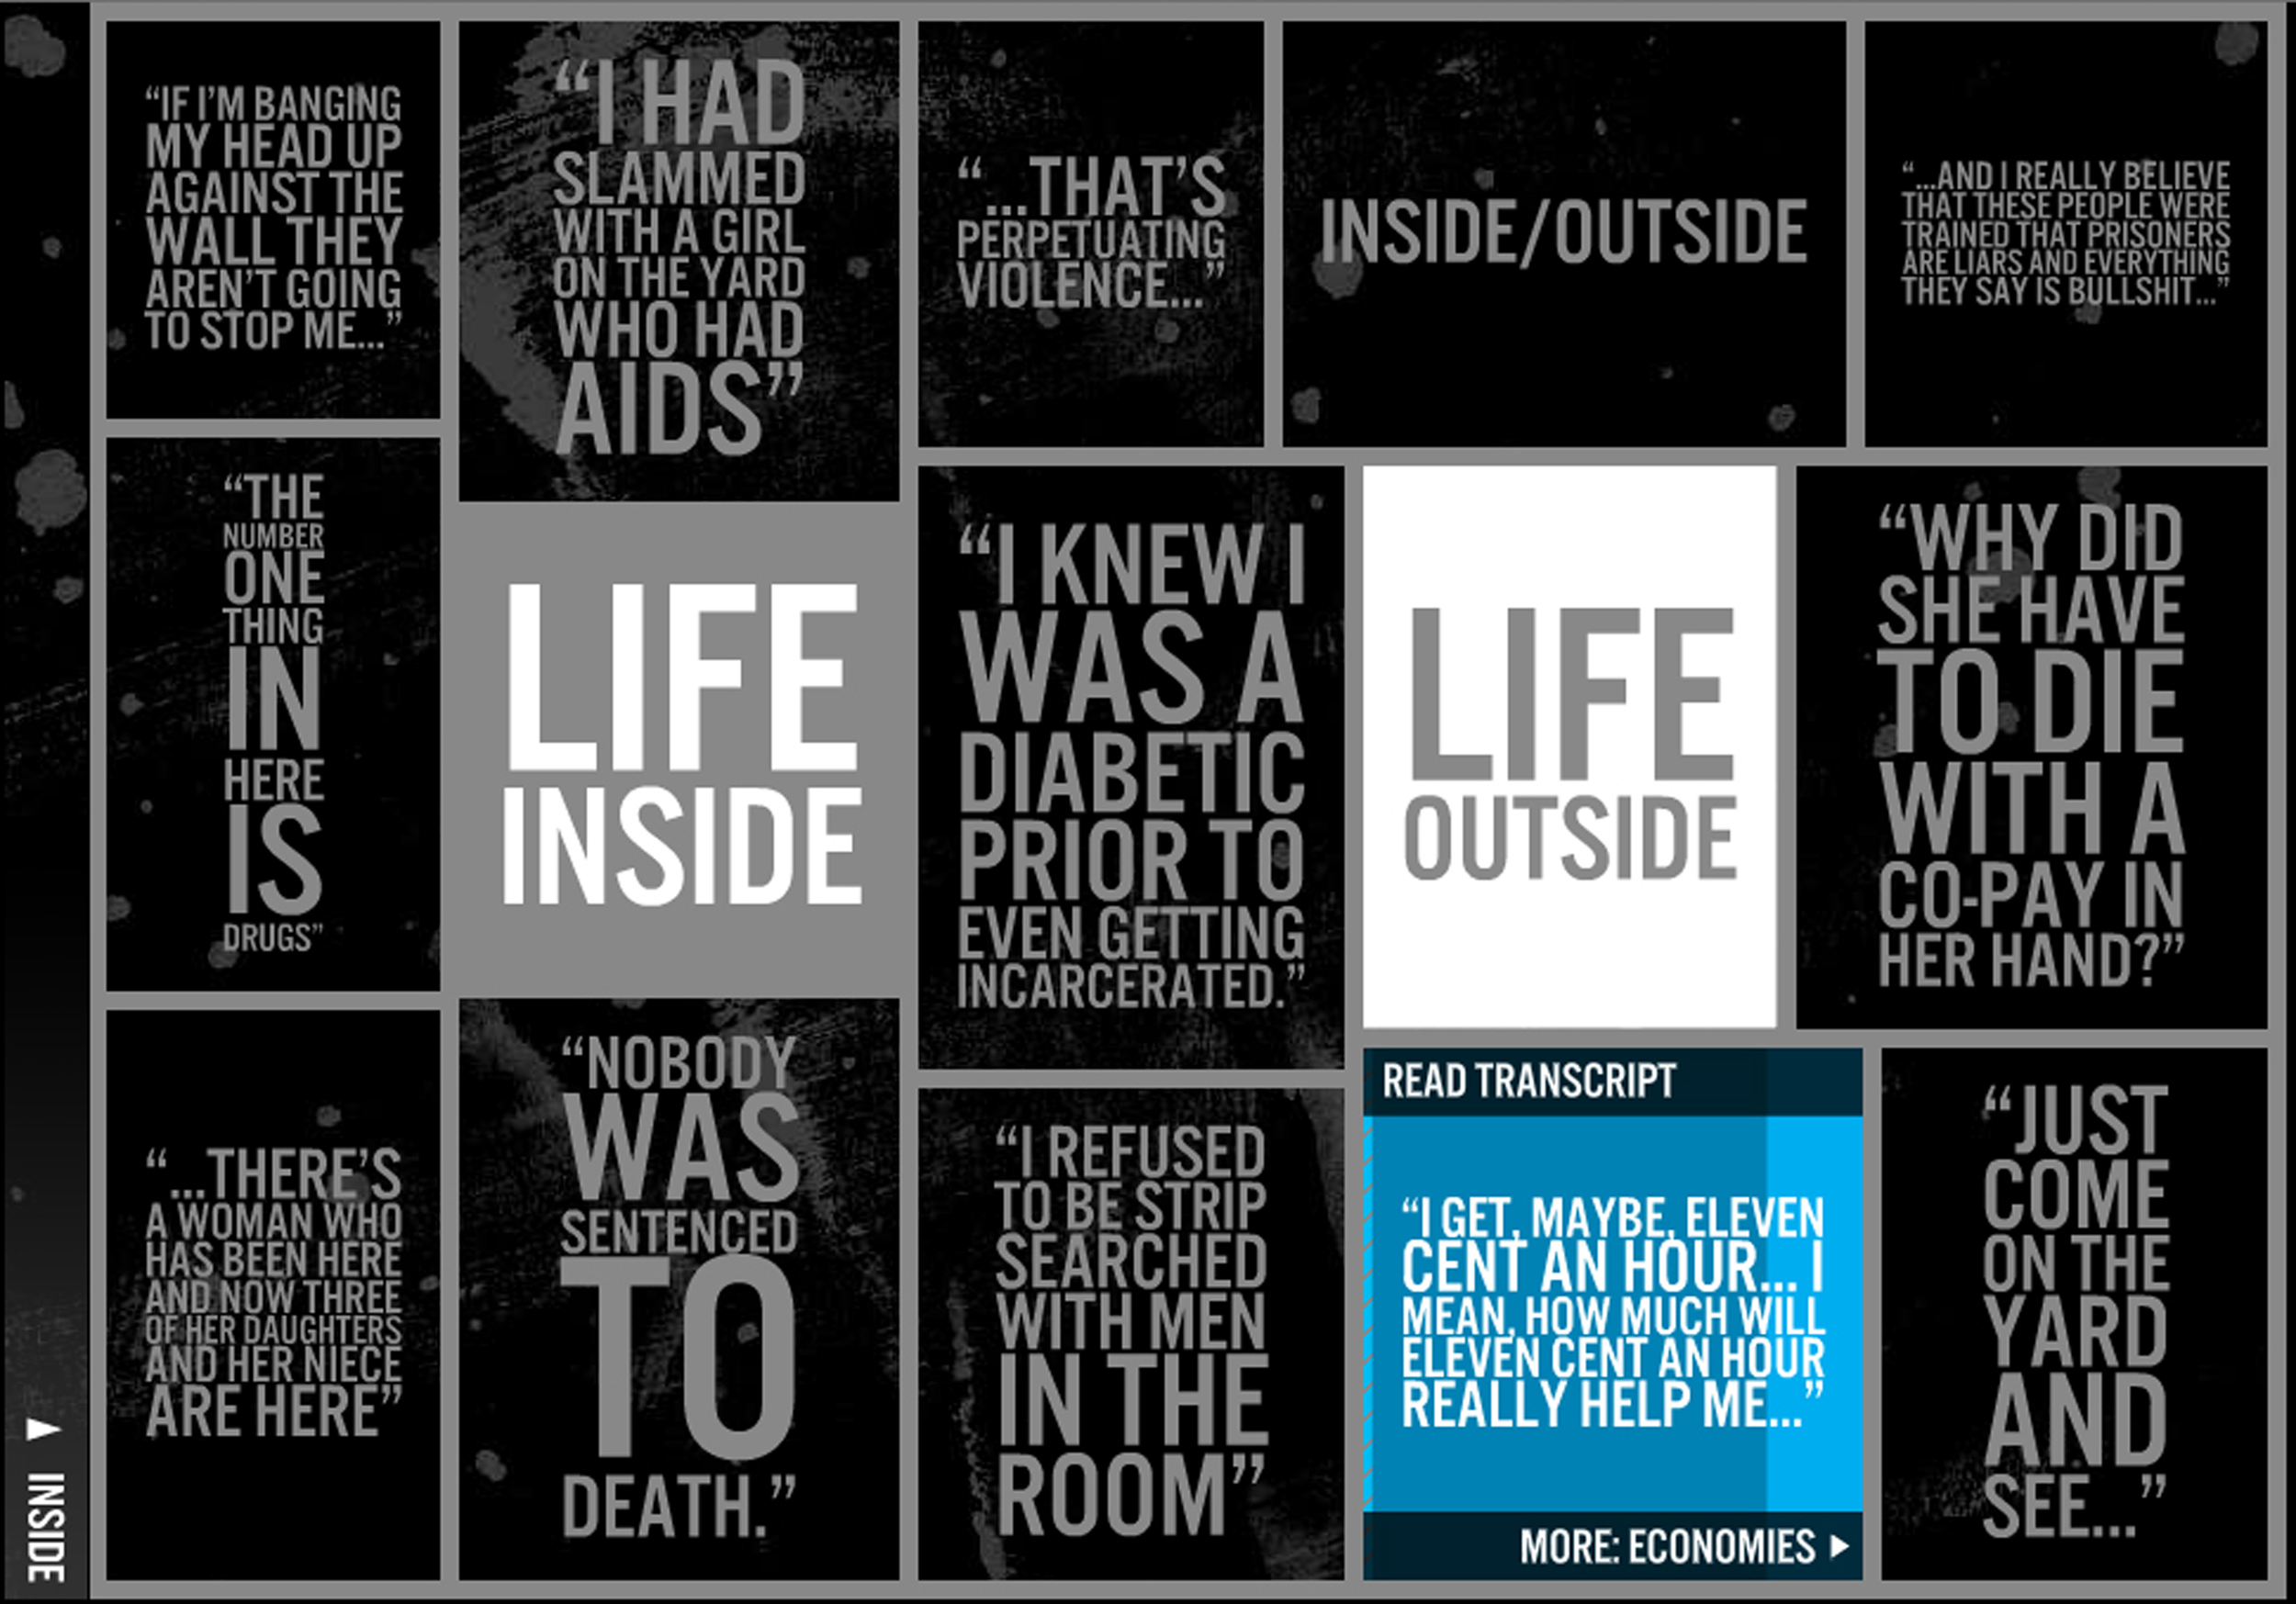 insideoutside.jpg